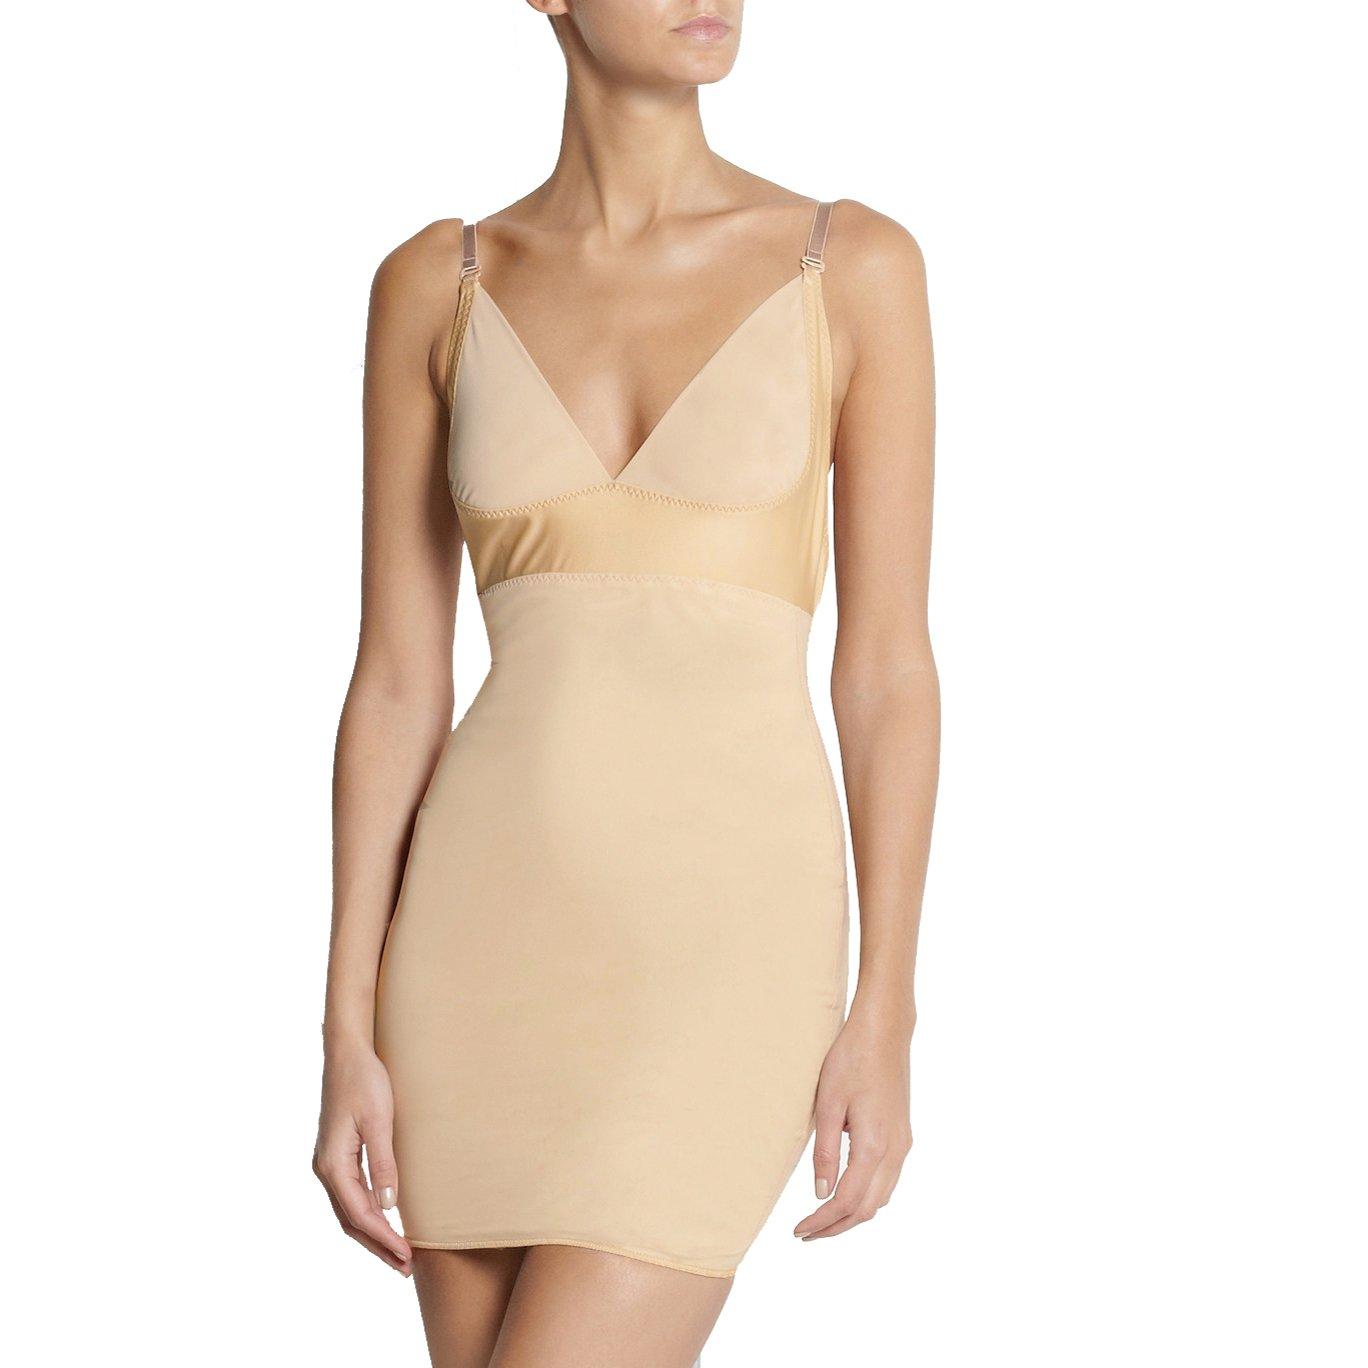 AICONL Women's Control Slip Dress Seamless Full Body Shaper Under Dresses